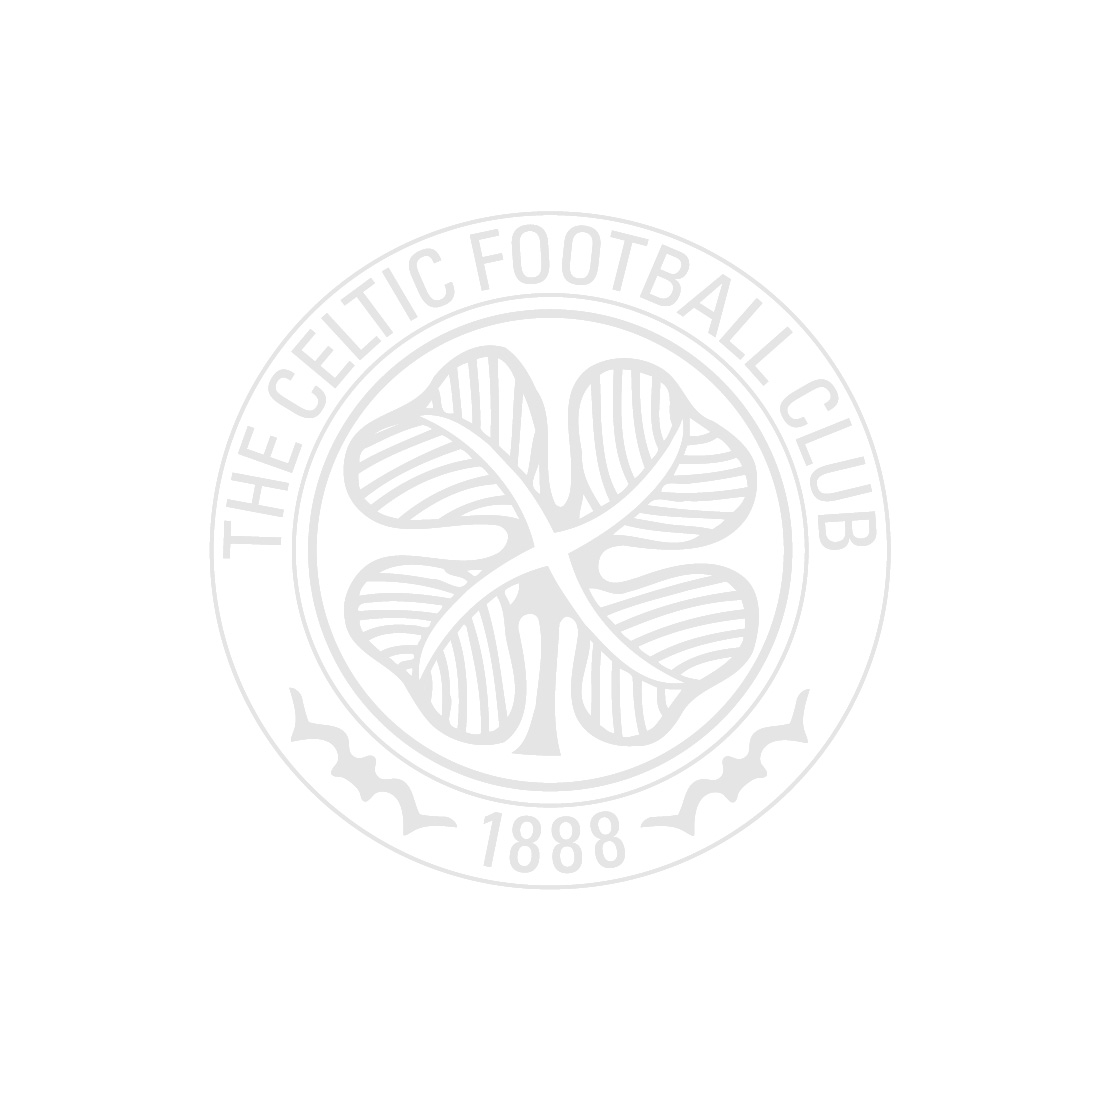 Celtic FC Infant 20/21 Home Kit